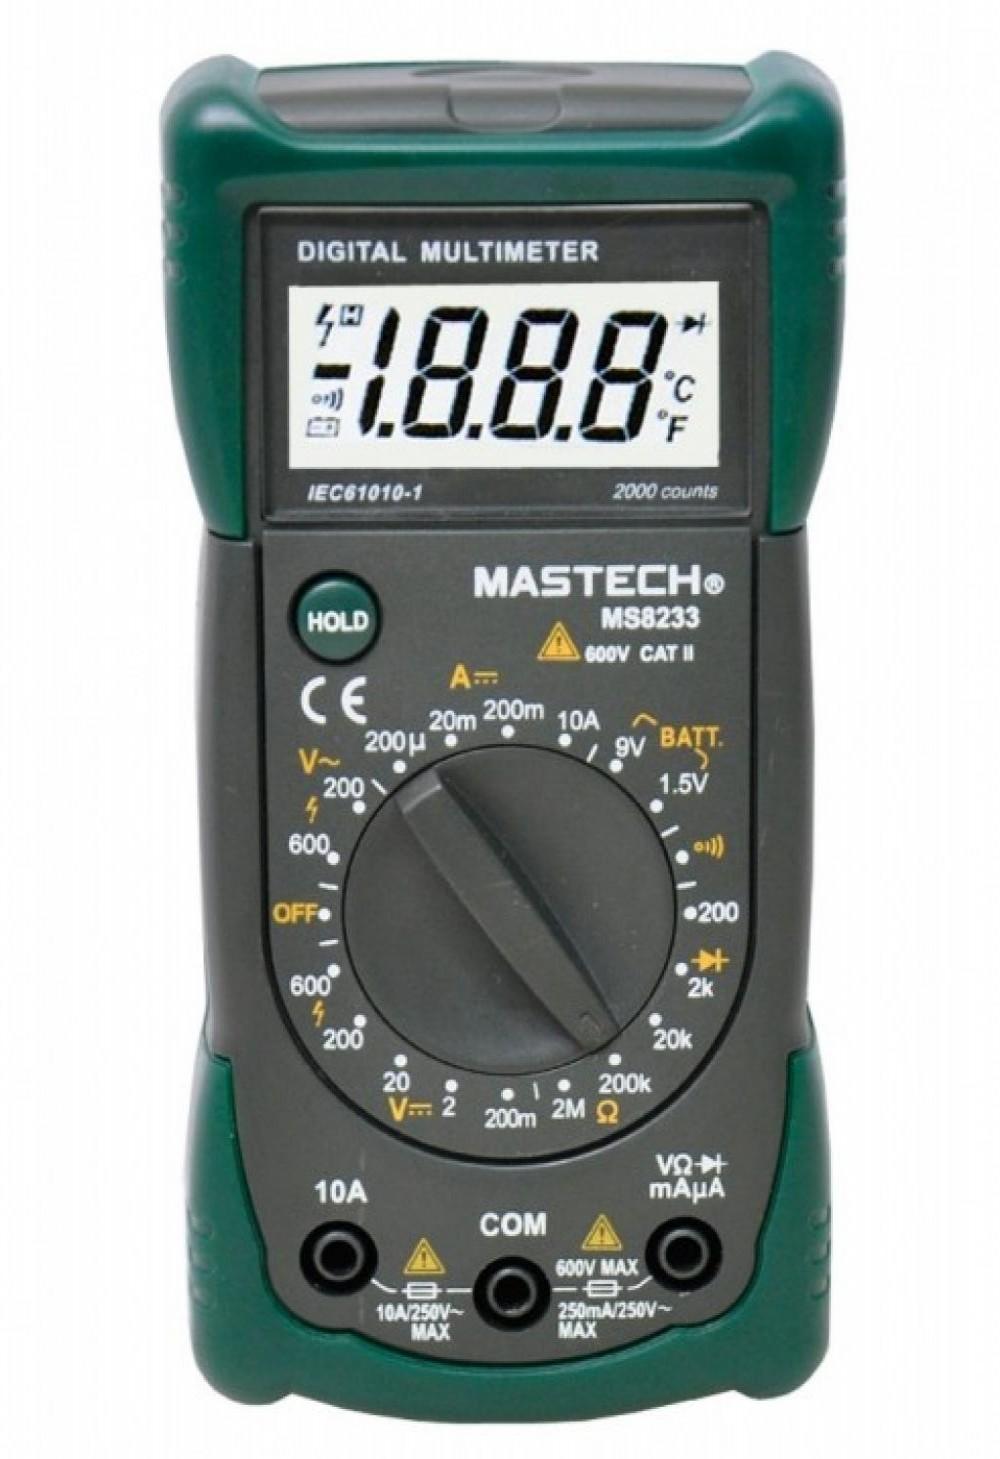 VOYAGER MULTIMETRO DIGITAL MS8233A